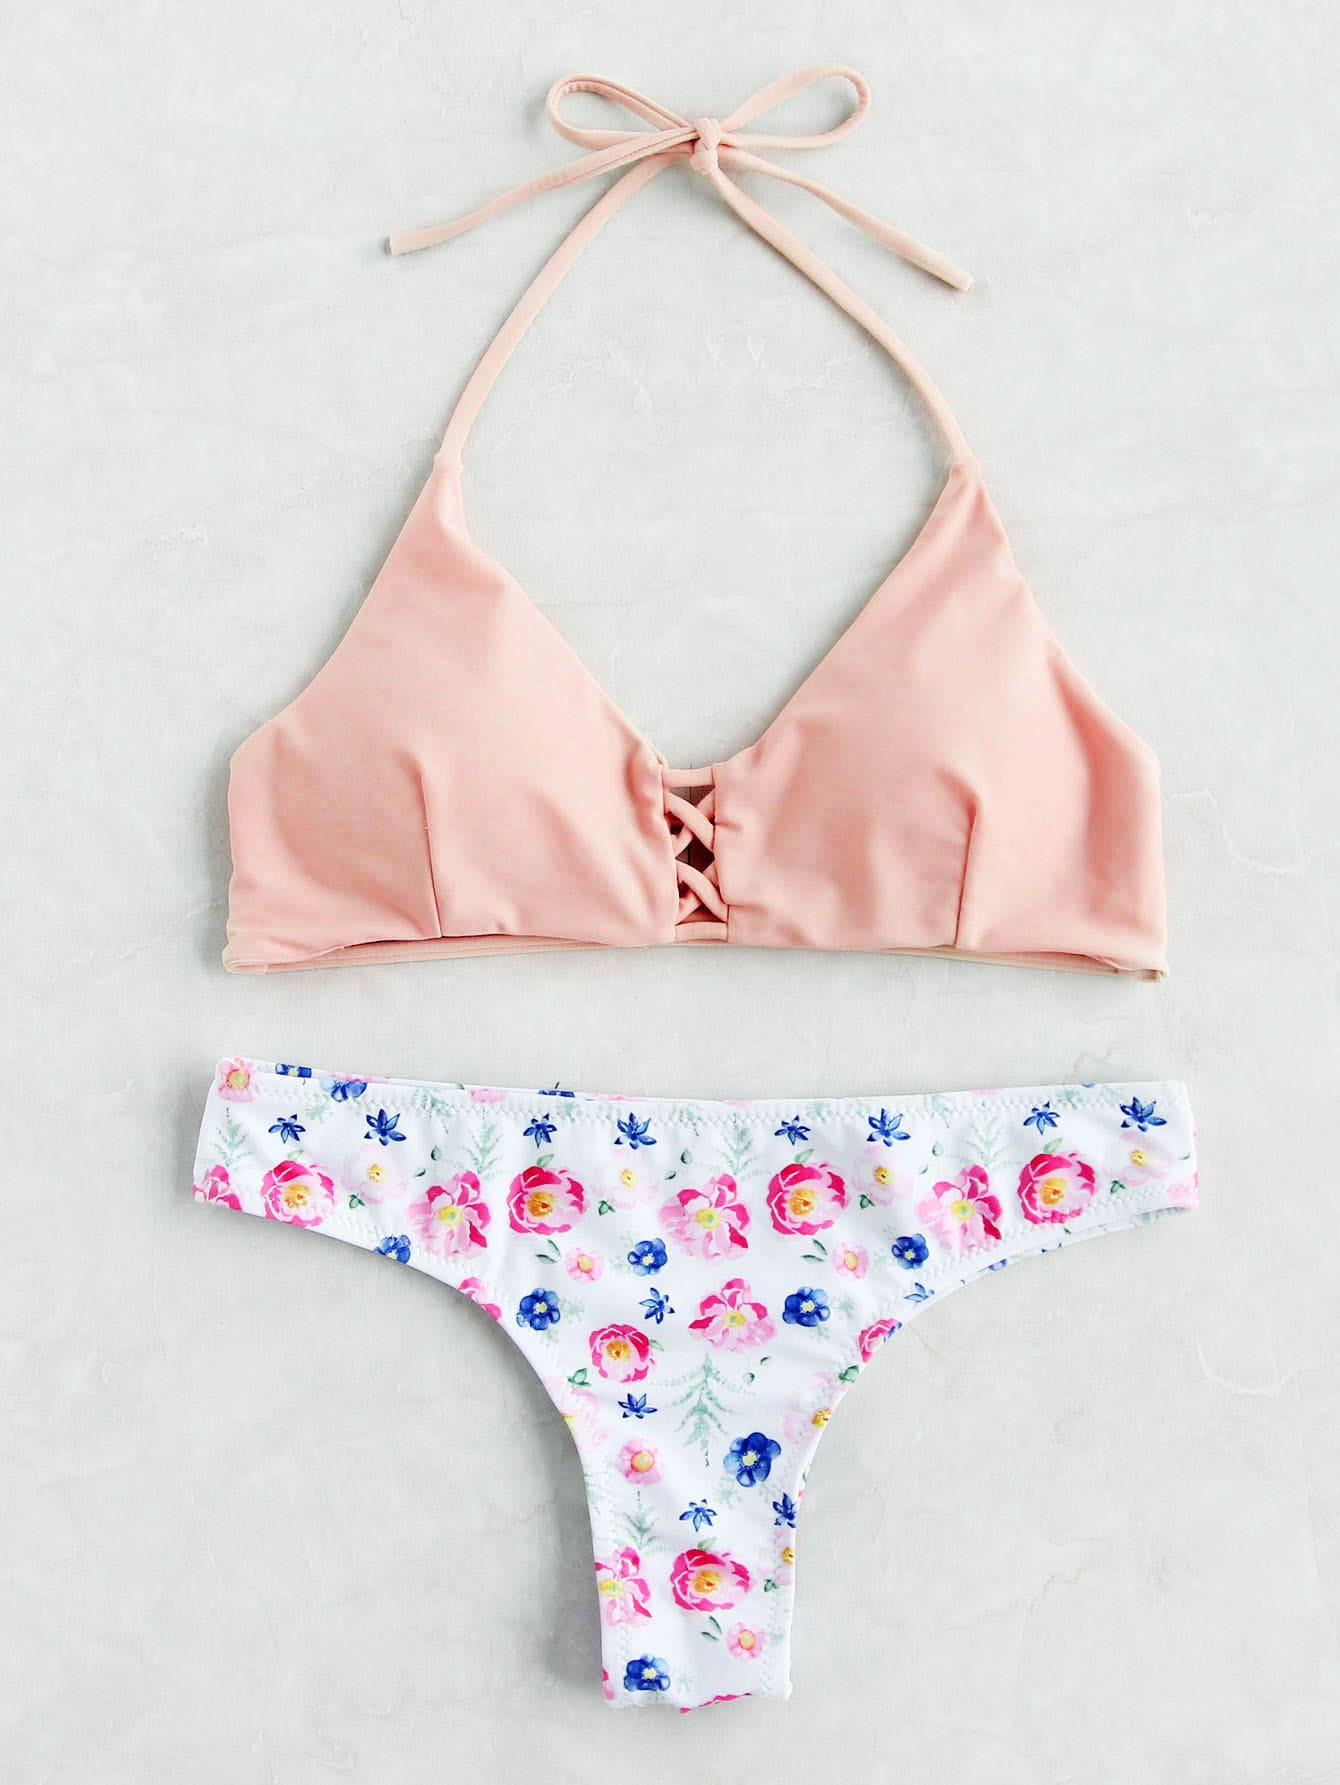 Calico Print Criss Cross Bikini Set swimwear170502302